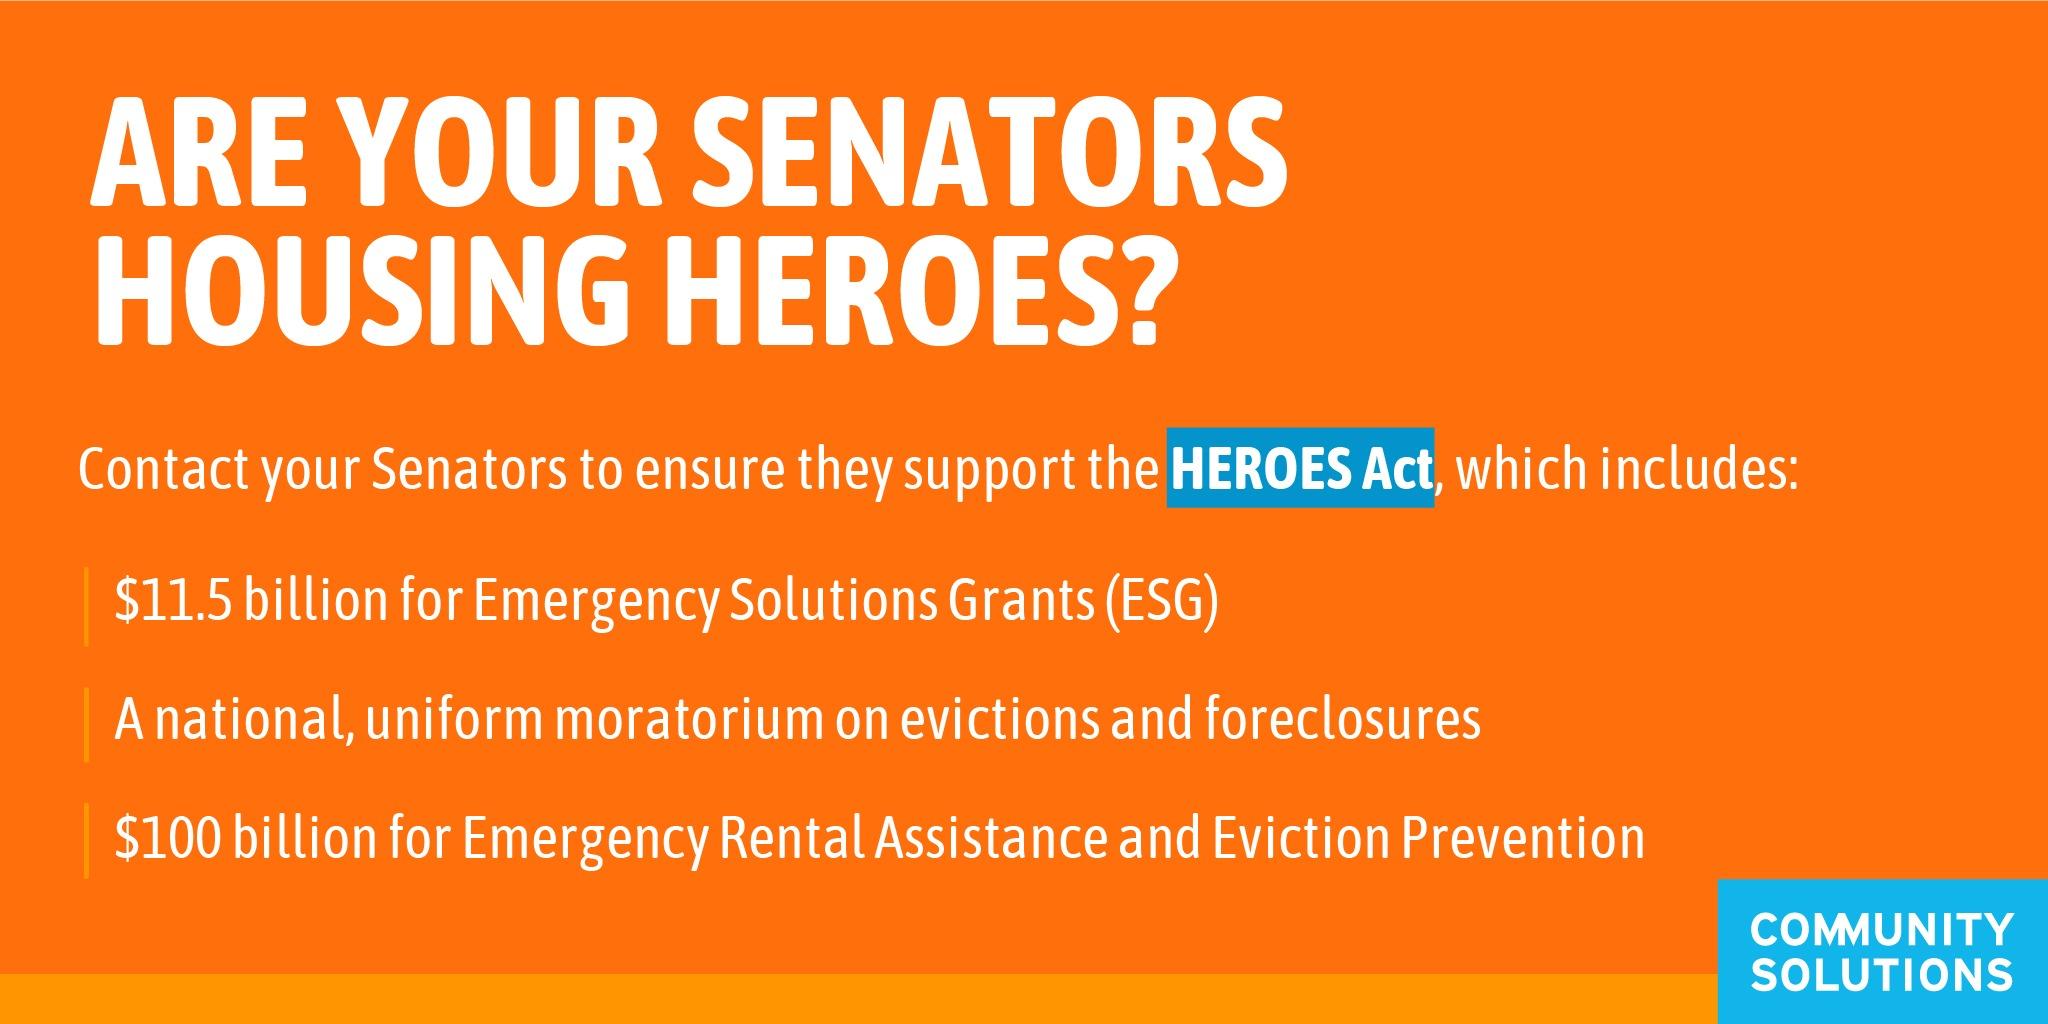 are your Senators Housing HEROES